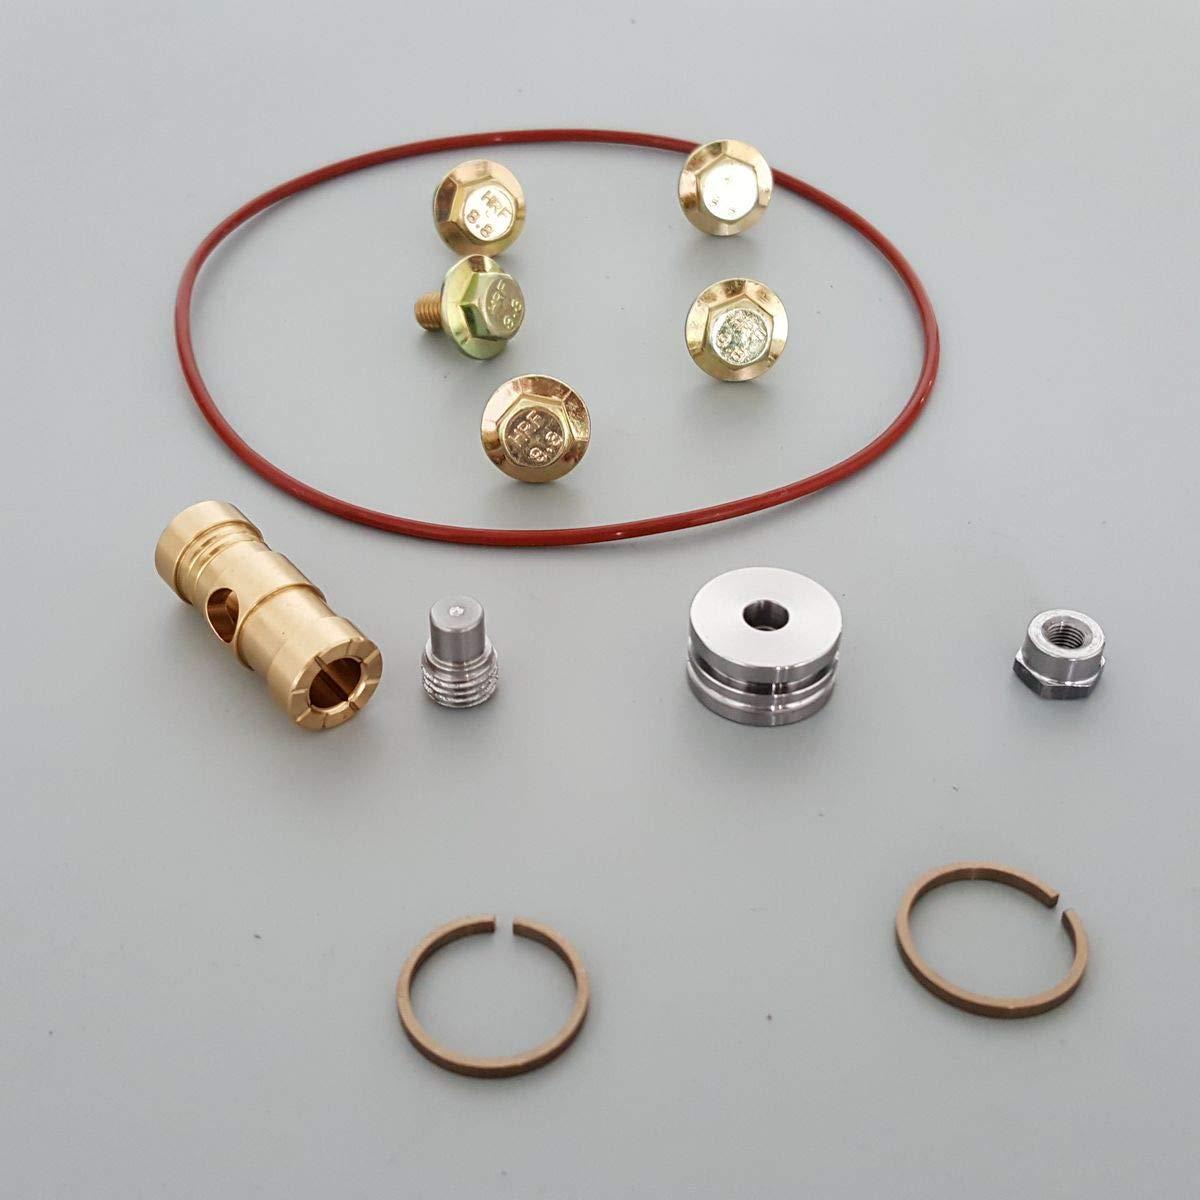 For Subaru Impreza WRX STI DOCH RHF55 VF37 VF39 Isuzu CIES VIAK VIBA CIFK Turbo Repair Rebuild kit